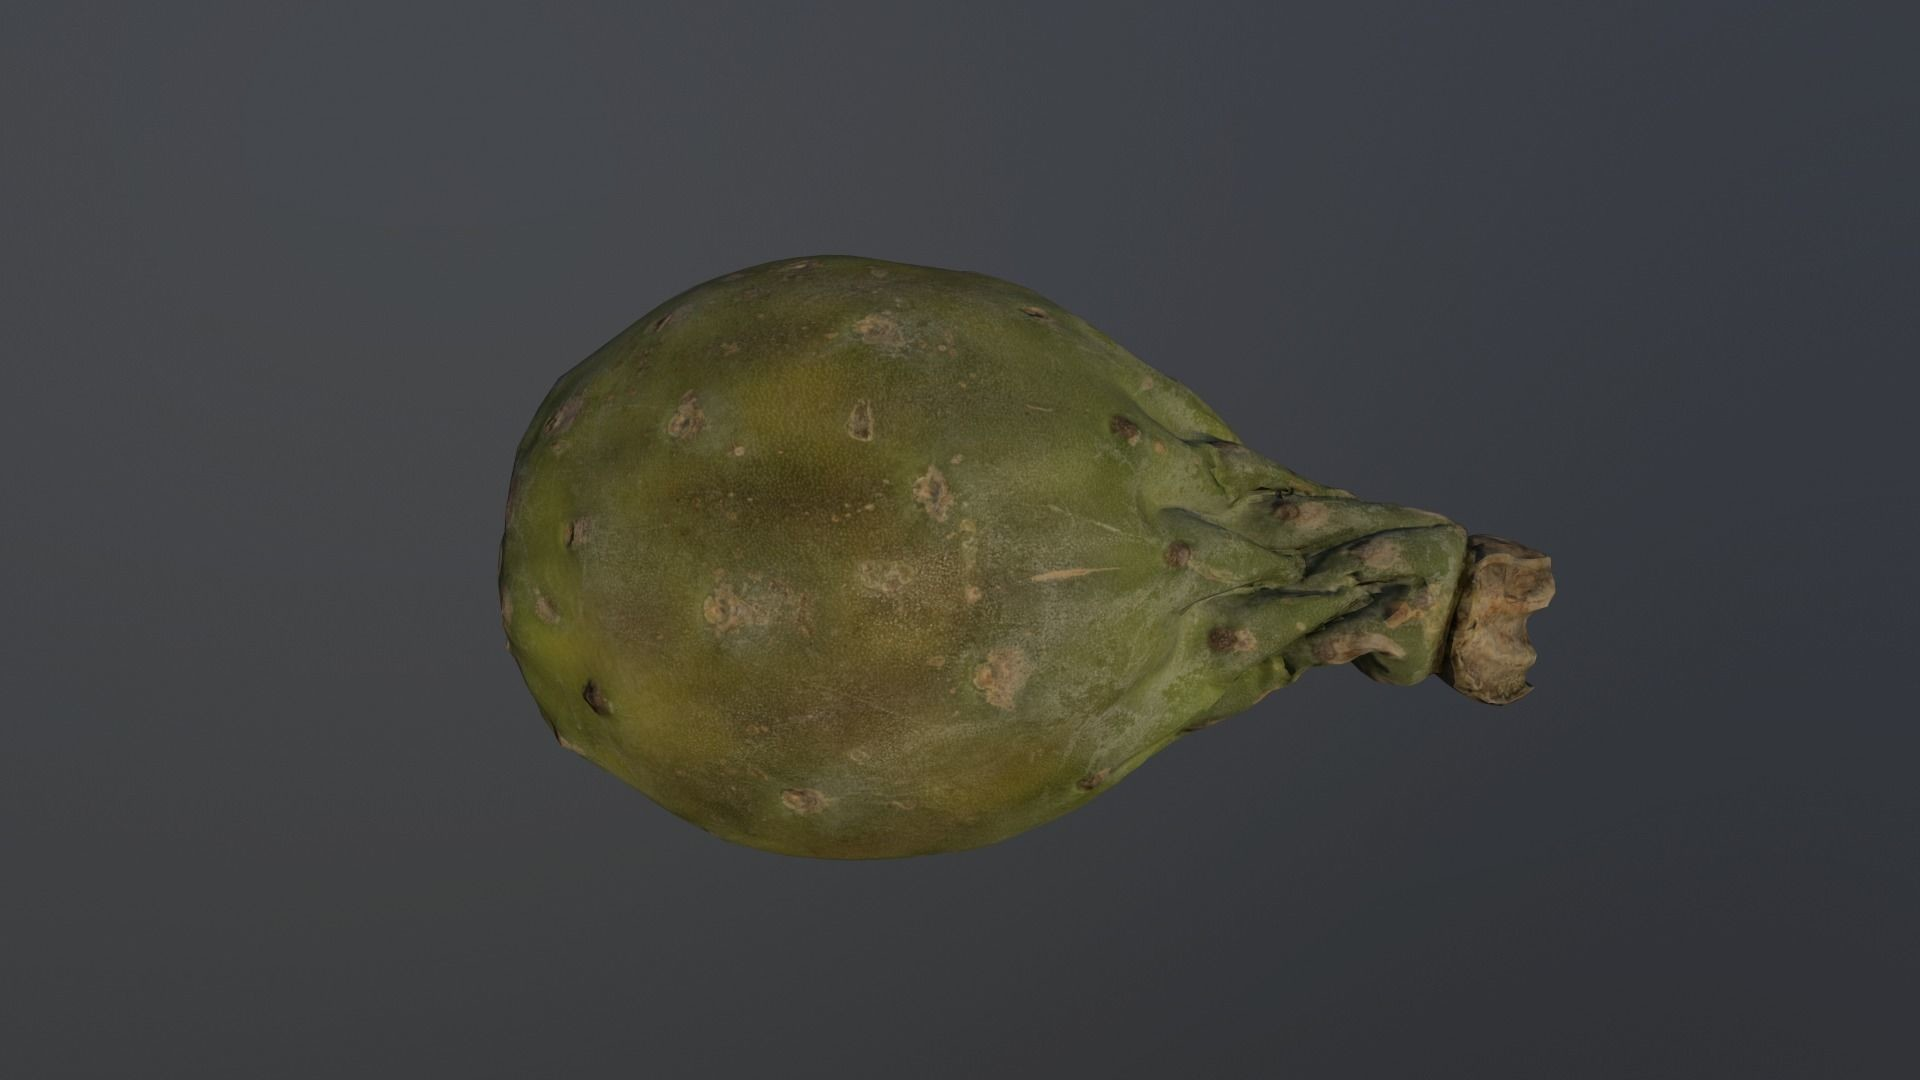 Carlos faustino opuntia ficus indica indian fig 3d model low poly obj 3ds fbx mtl